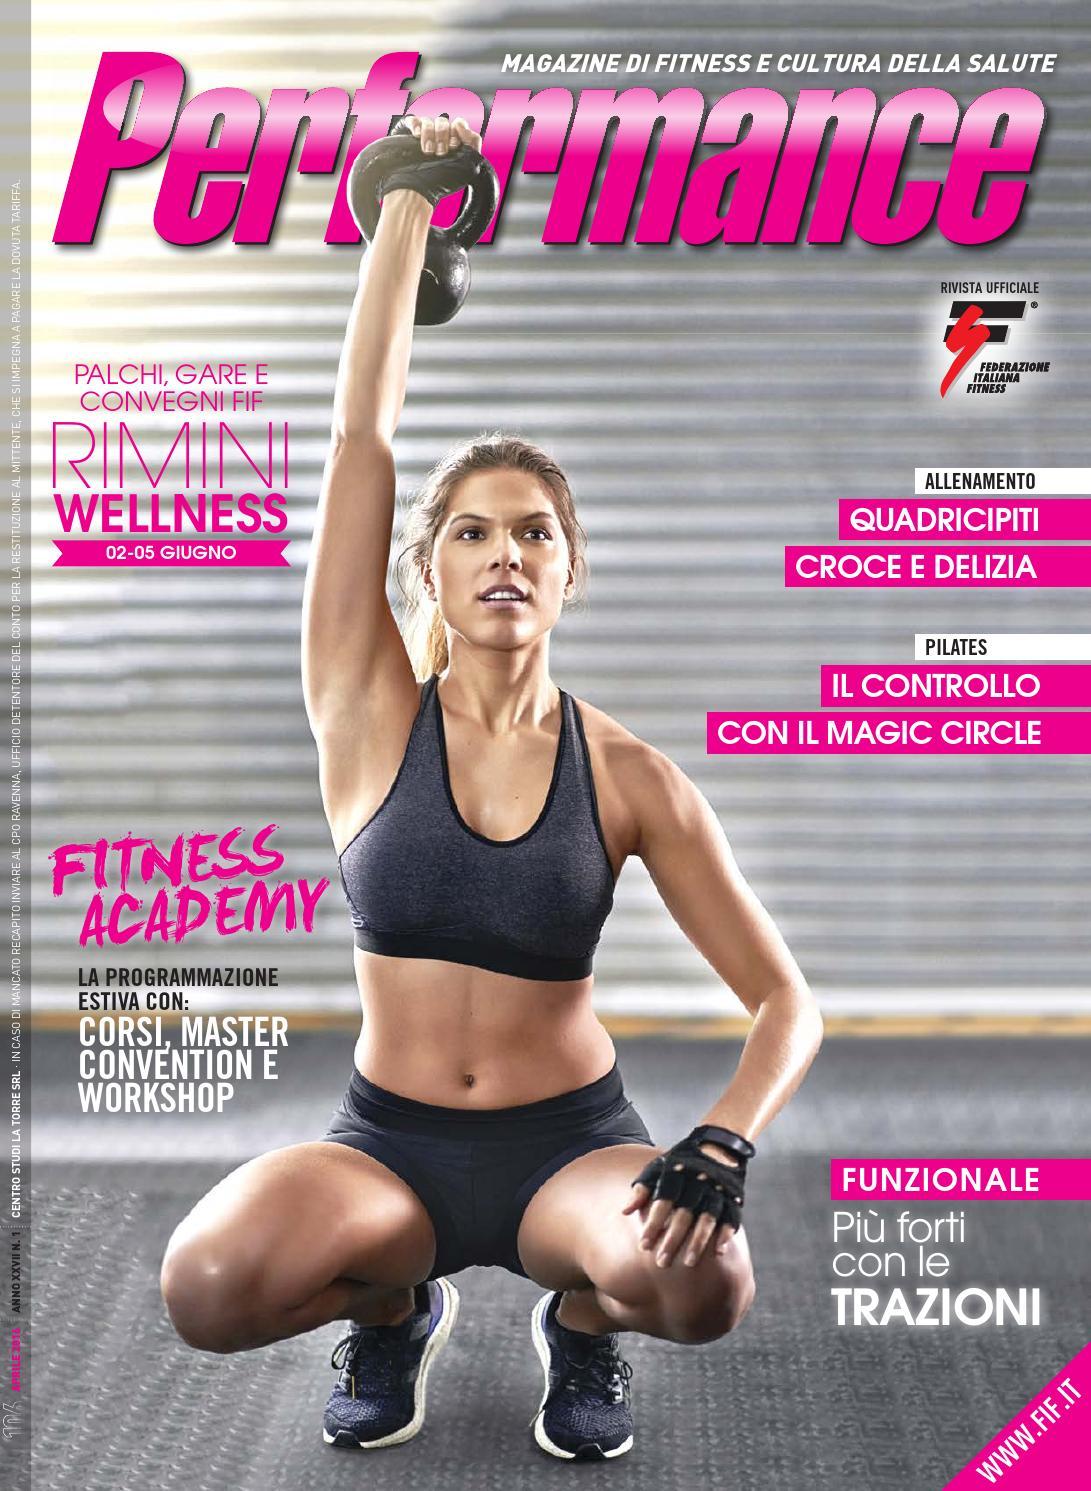 abbastanza Performance 01-2016 by Federazione Italiana Fitness - issuu XH19